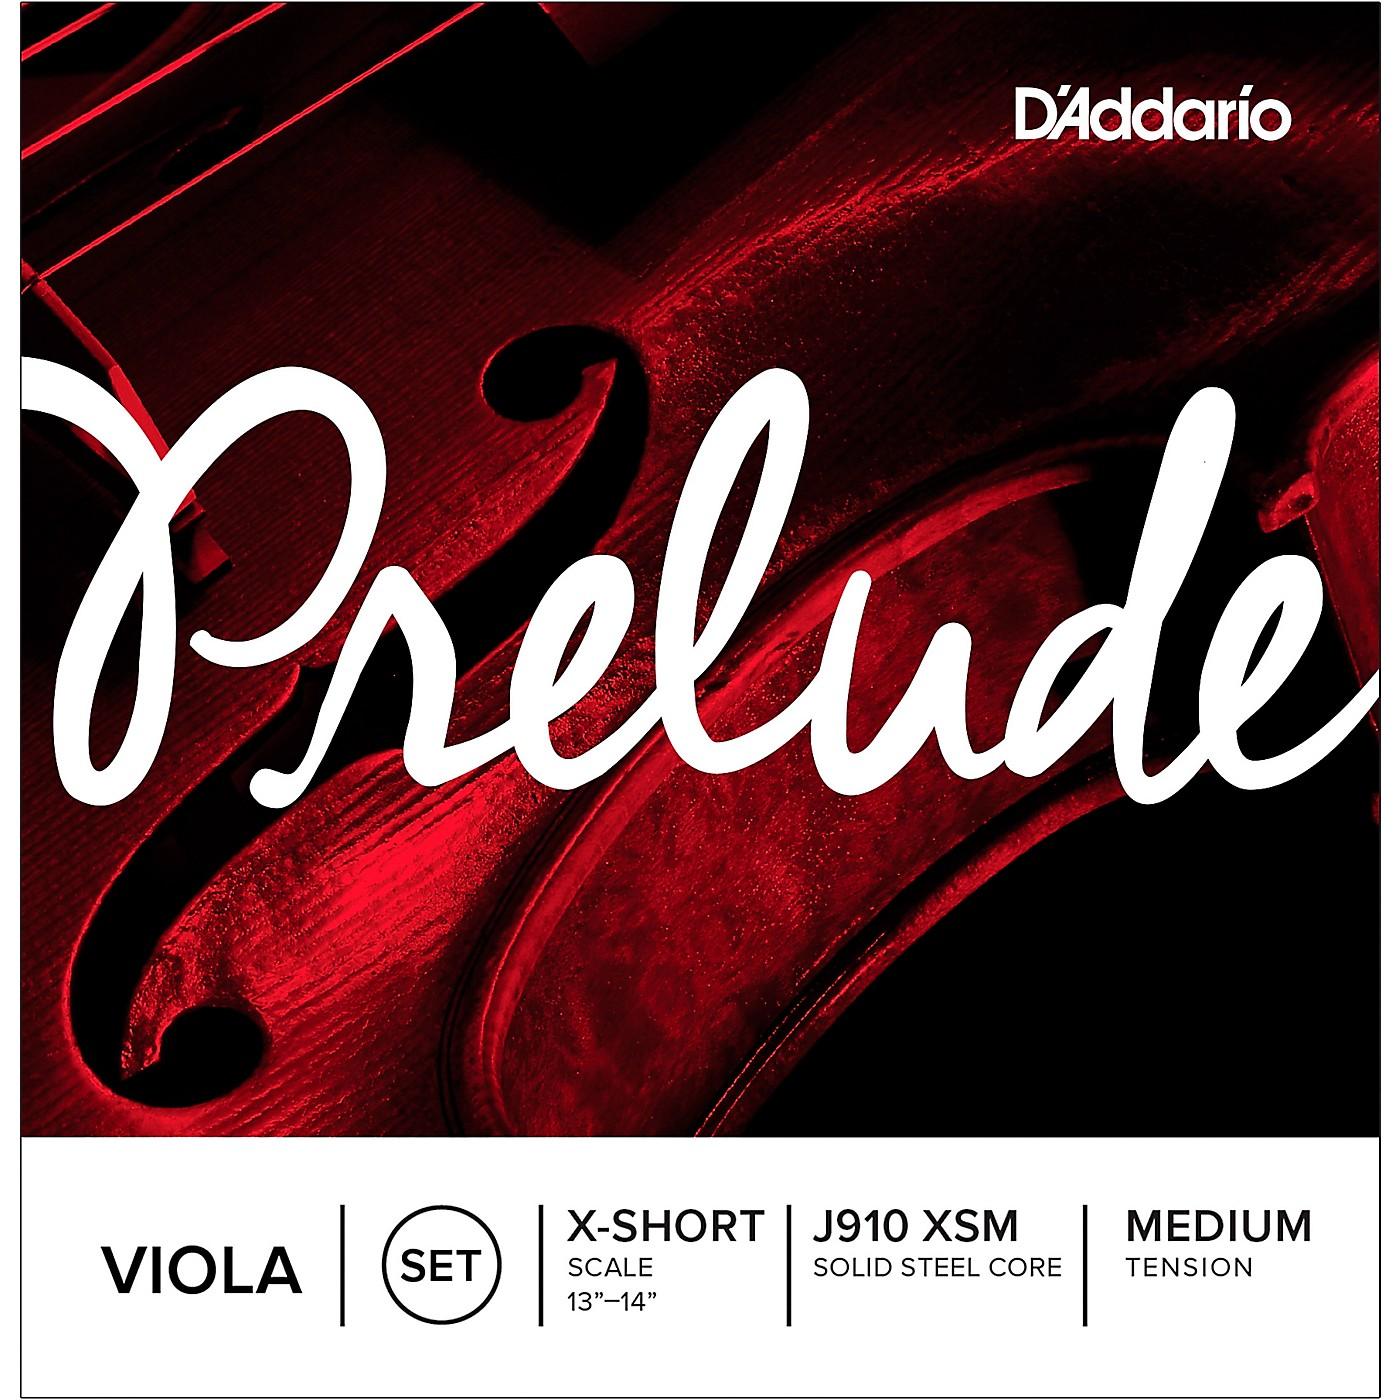 D'Addario Prelude Series Viola String Set thumbnail